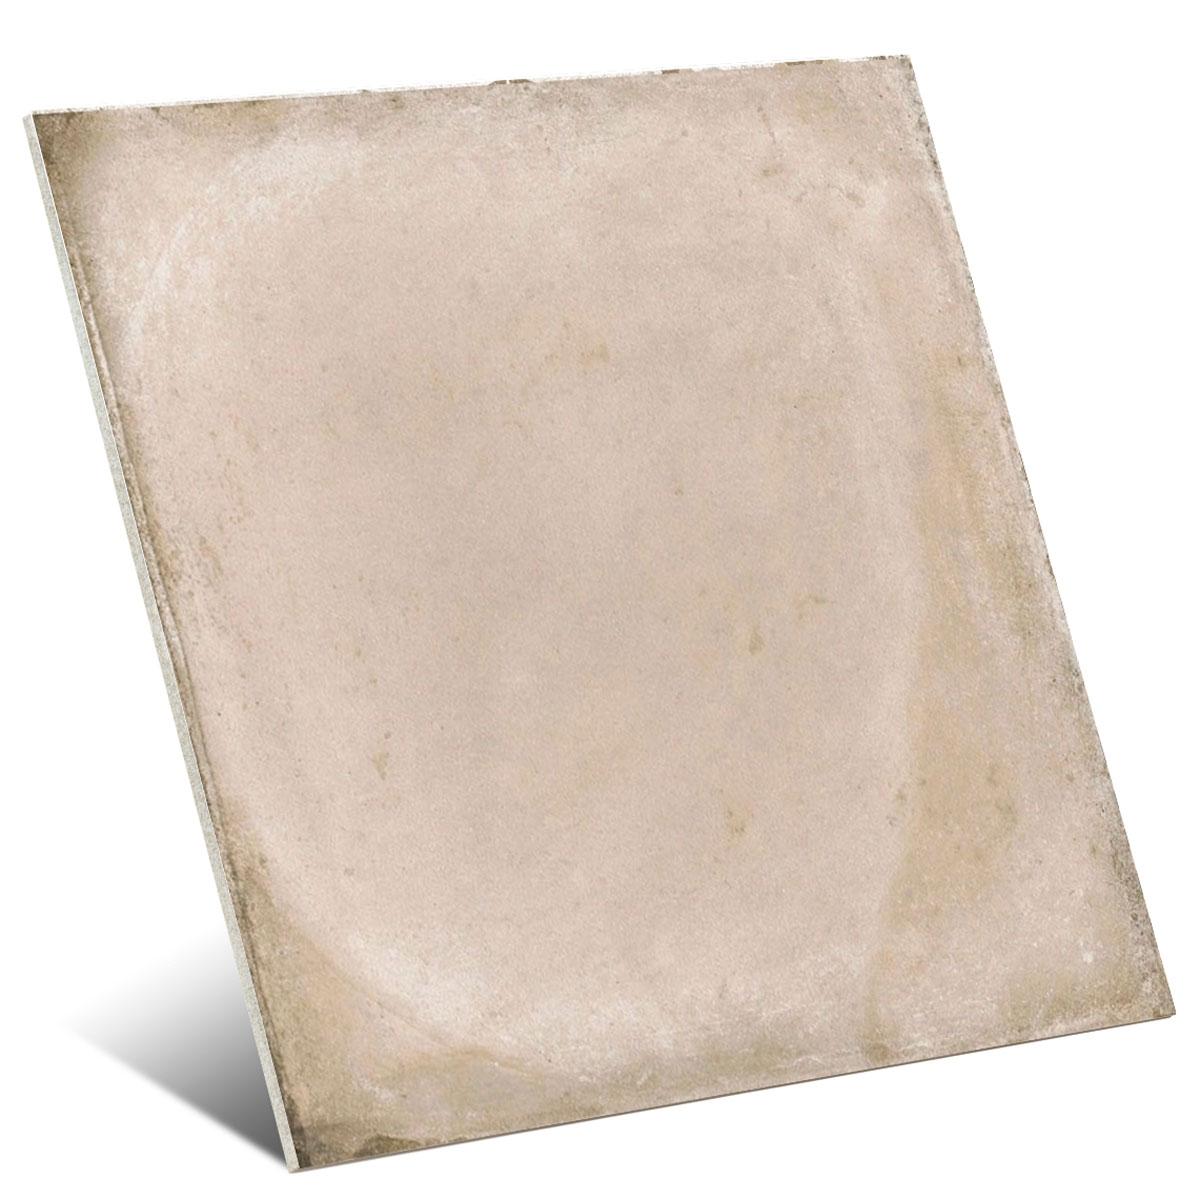 Alhamar Base 33x33 cm (caja 1 m2)